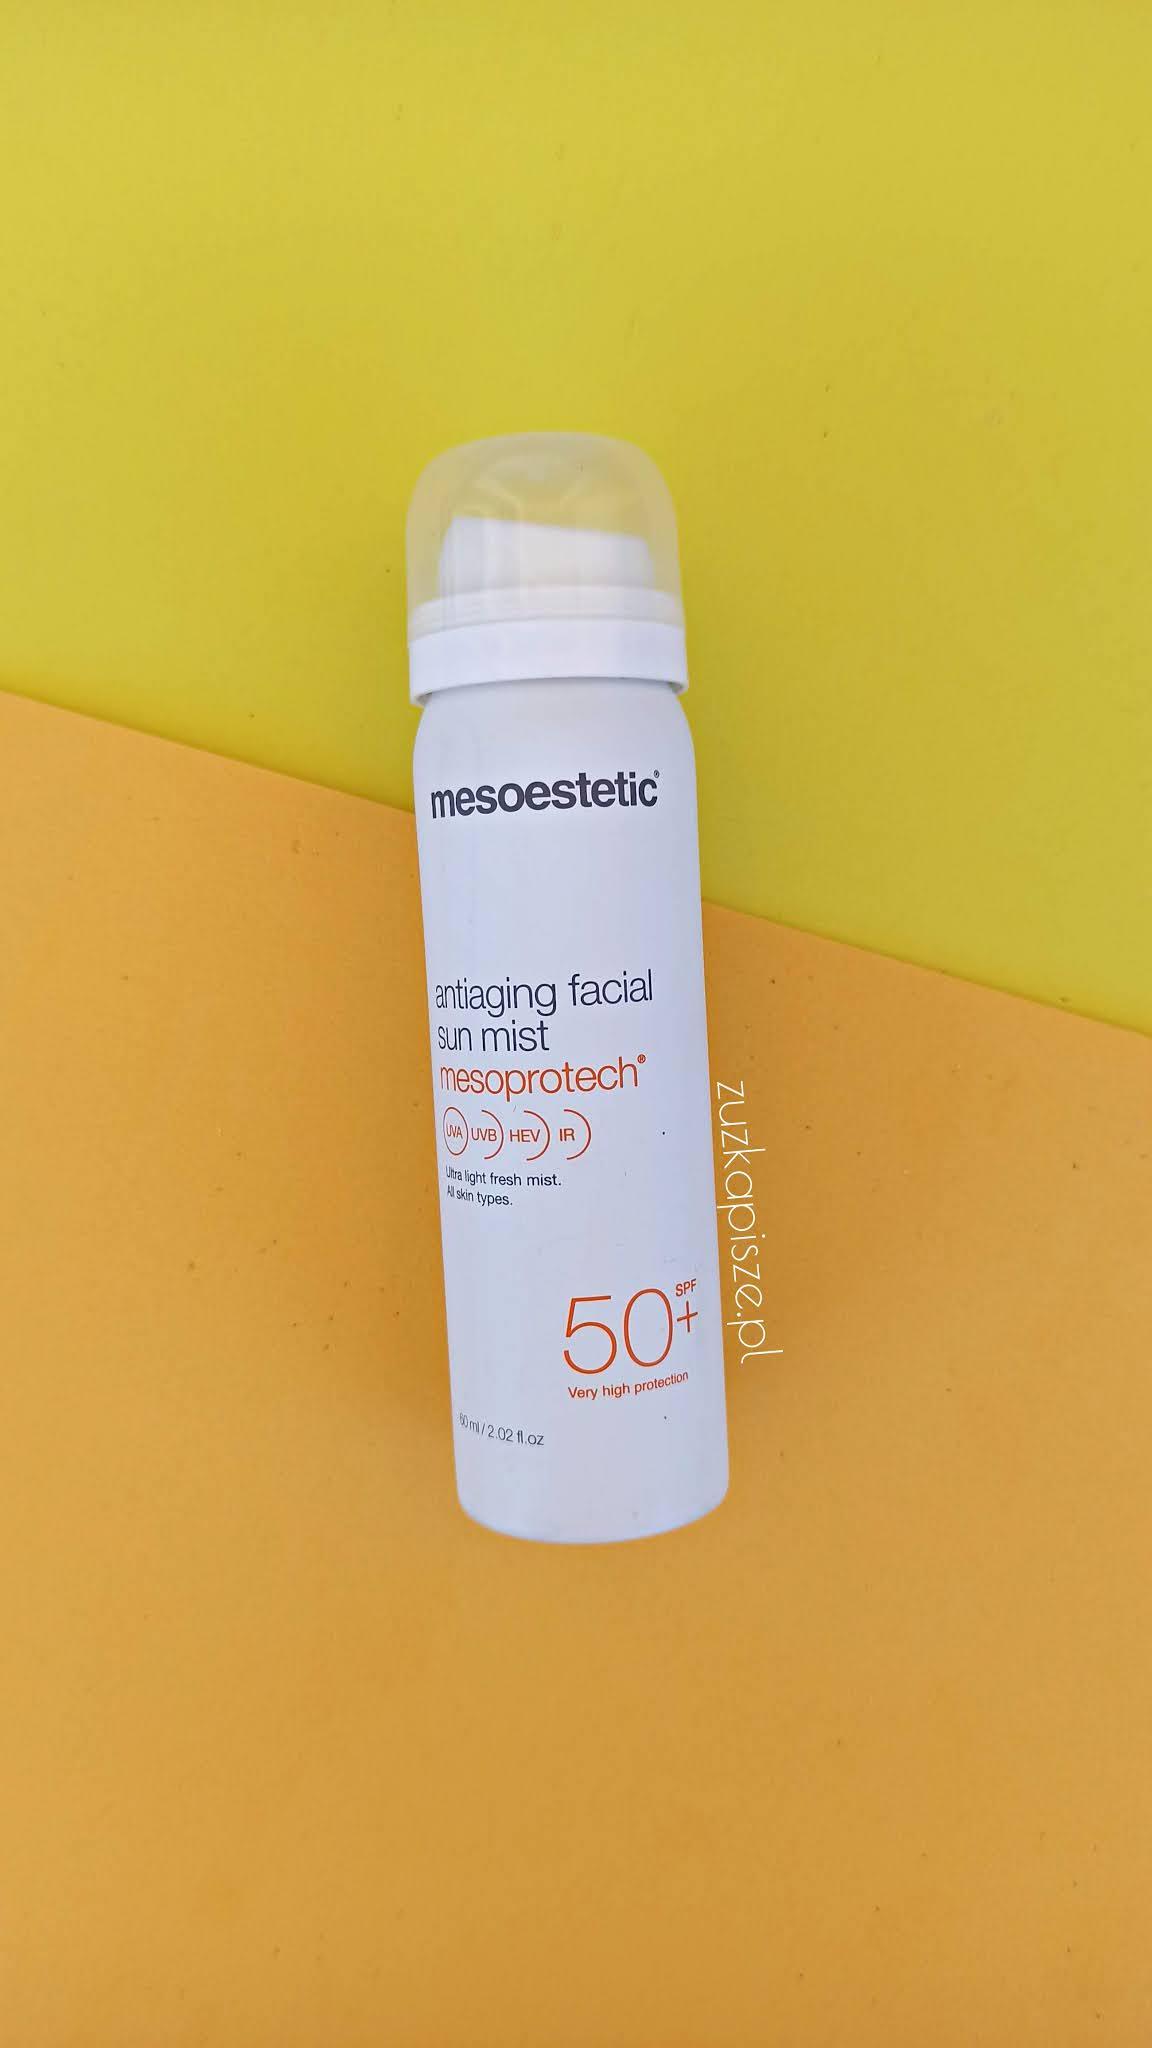 Mesoestetic Mesoprotech Antiaging Facial Sun Mist Mgiełka do twarzy SPF 50+ - topestetic.pl